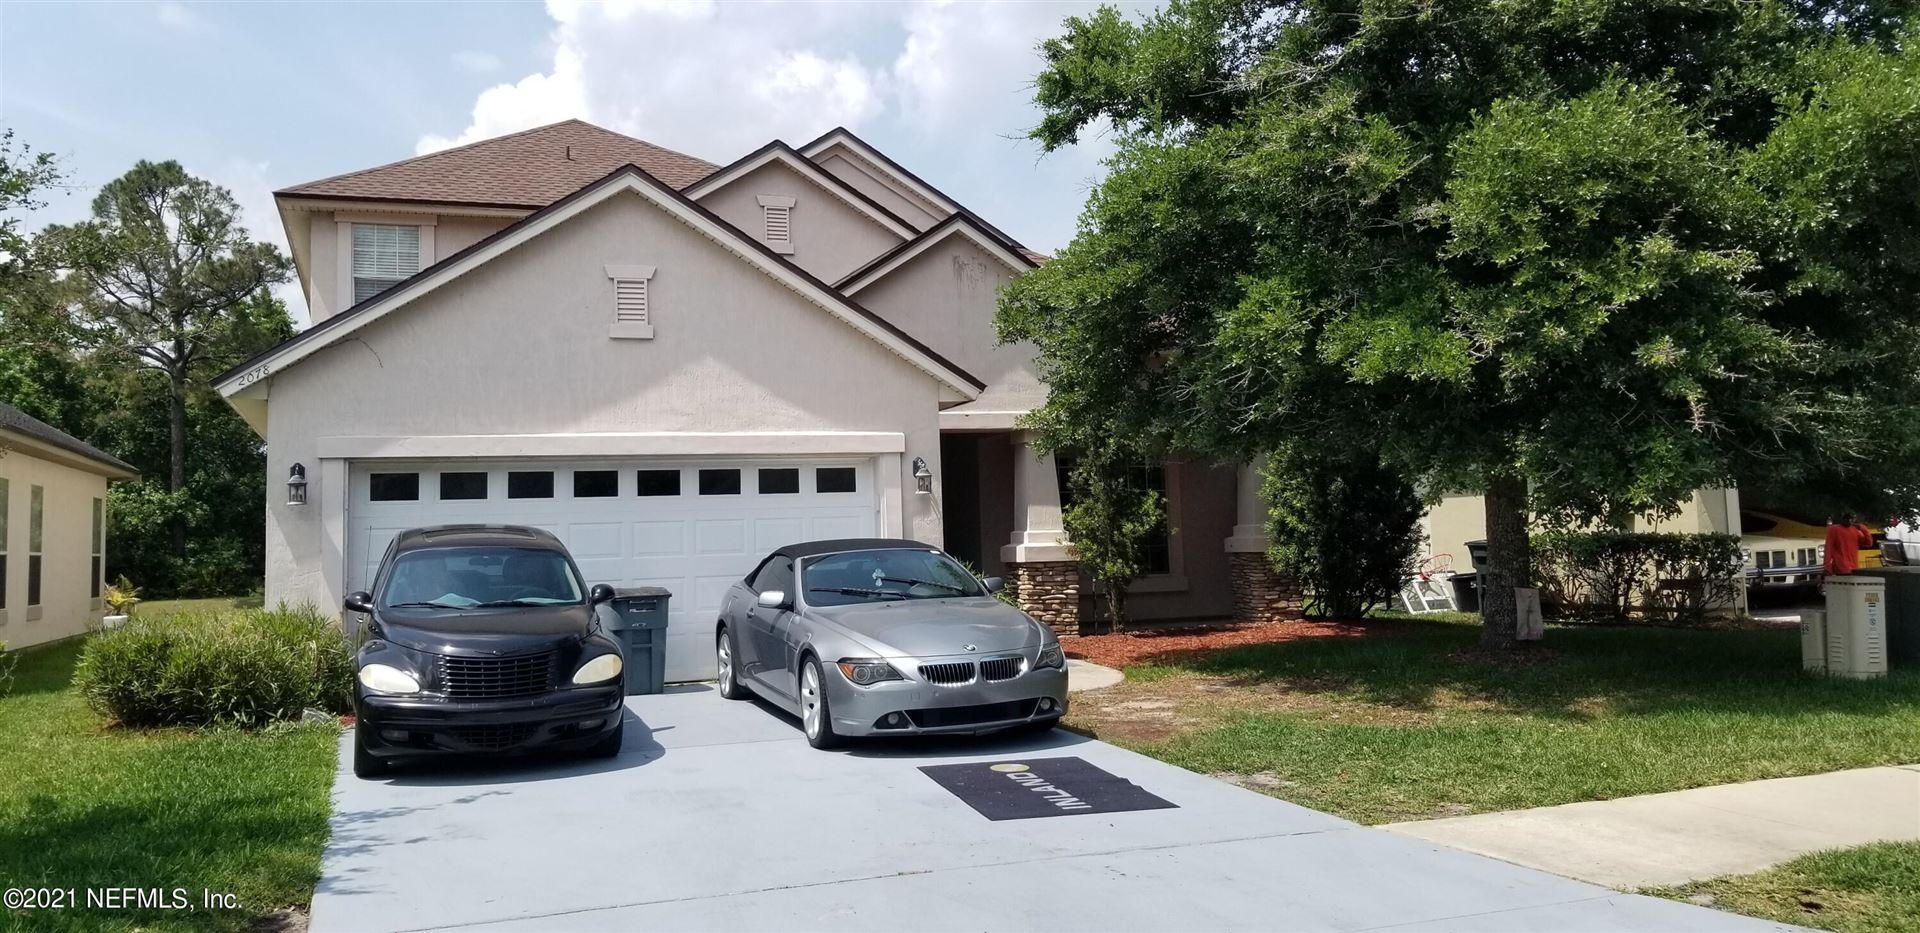 2078 HERITAGE OAKS CT #Lot No: 25, Orange Park, FL 32003 - MLS#: 1108585